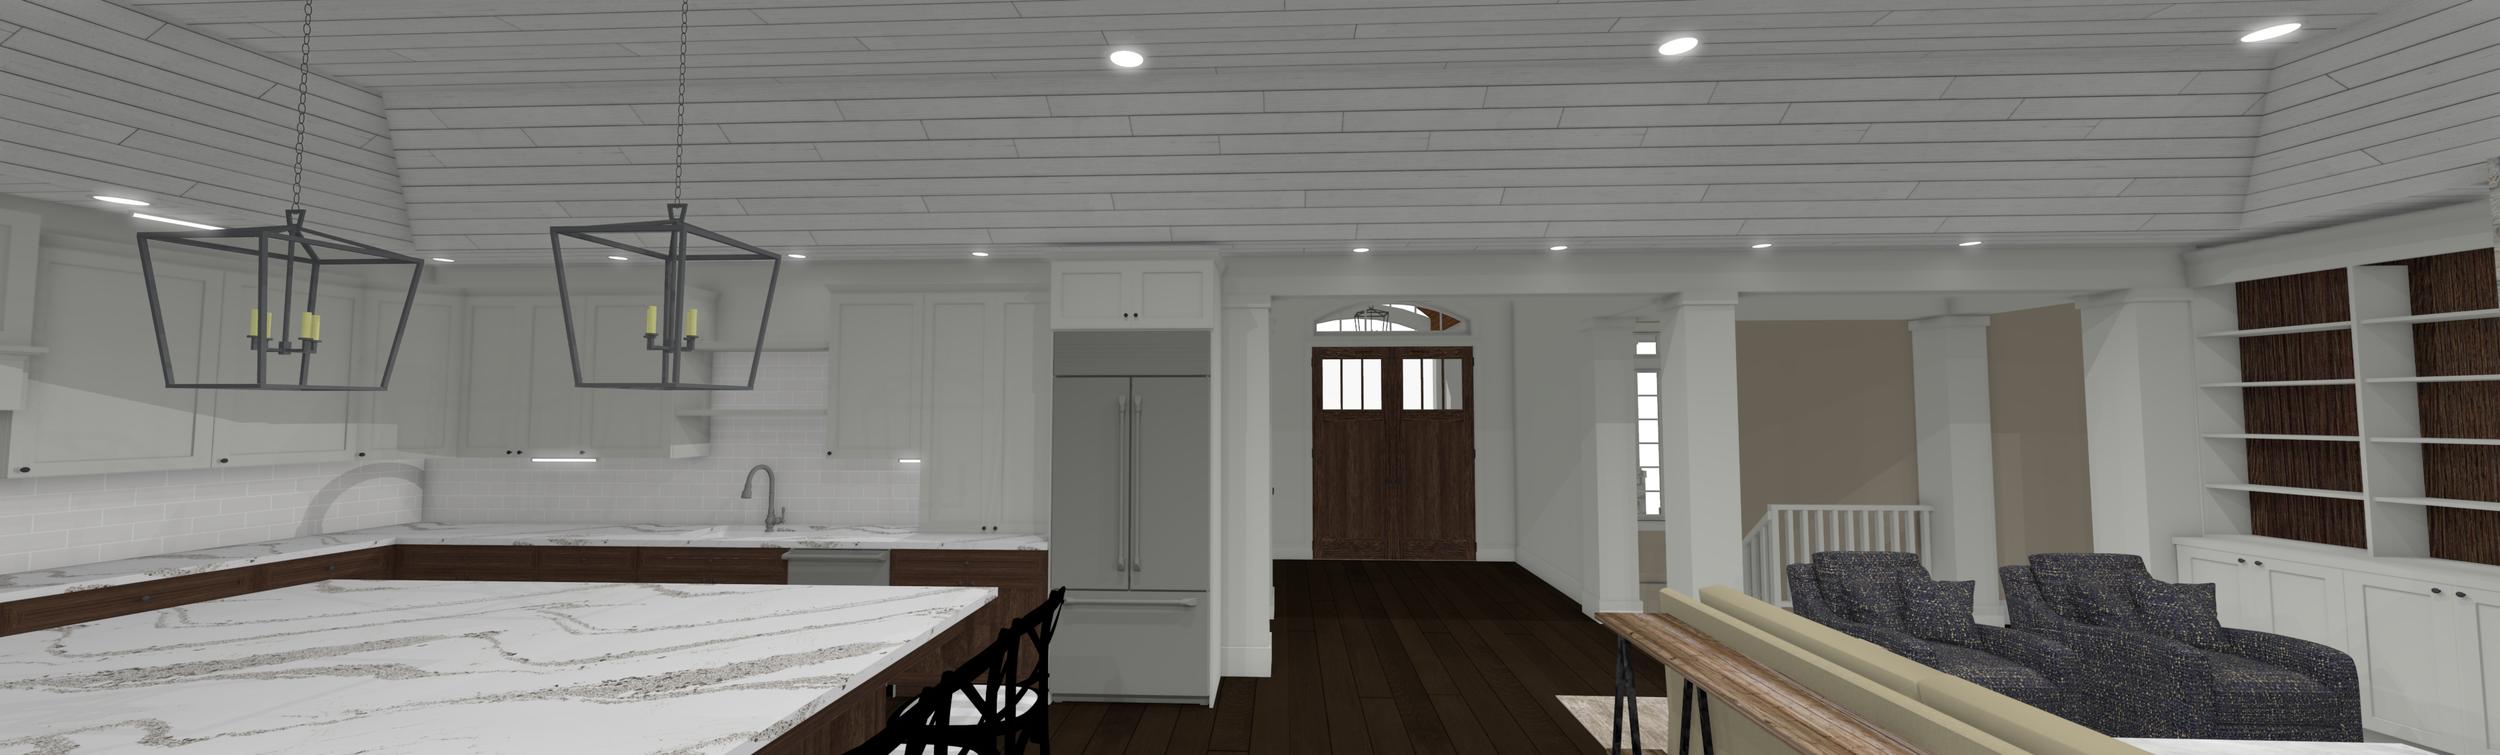 Updated Kitchen/Living Room Design